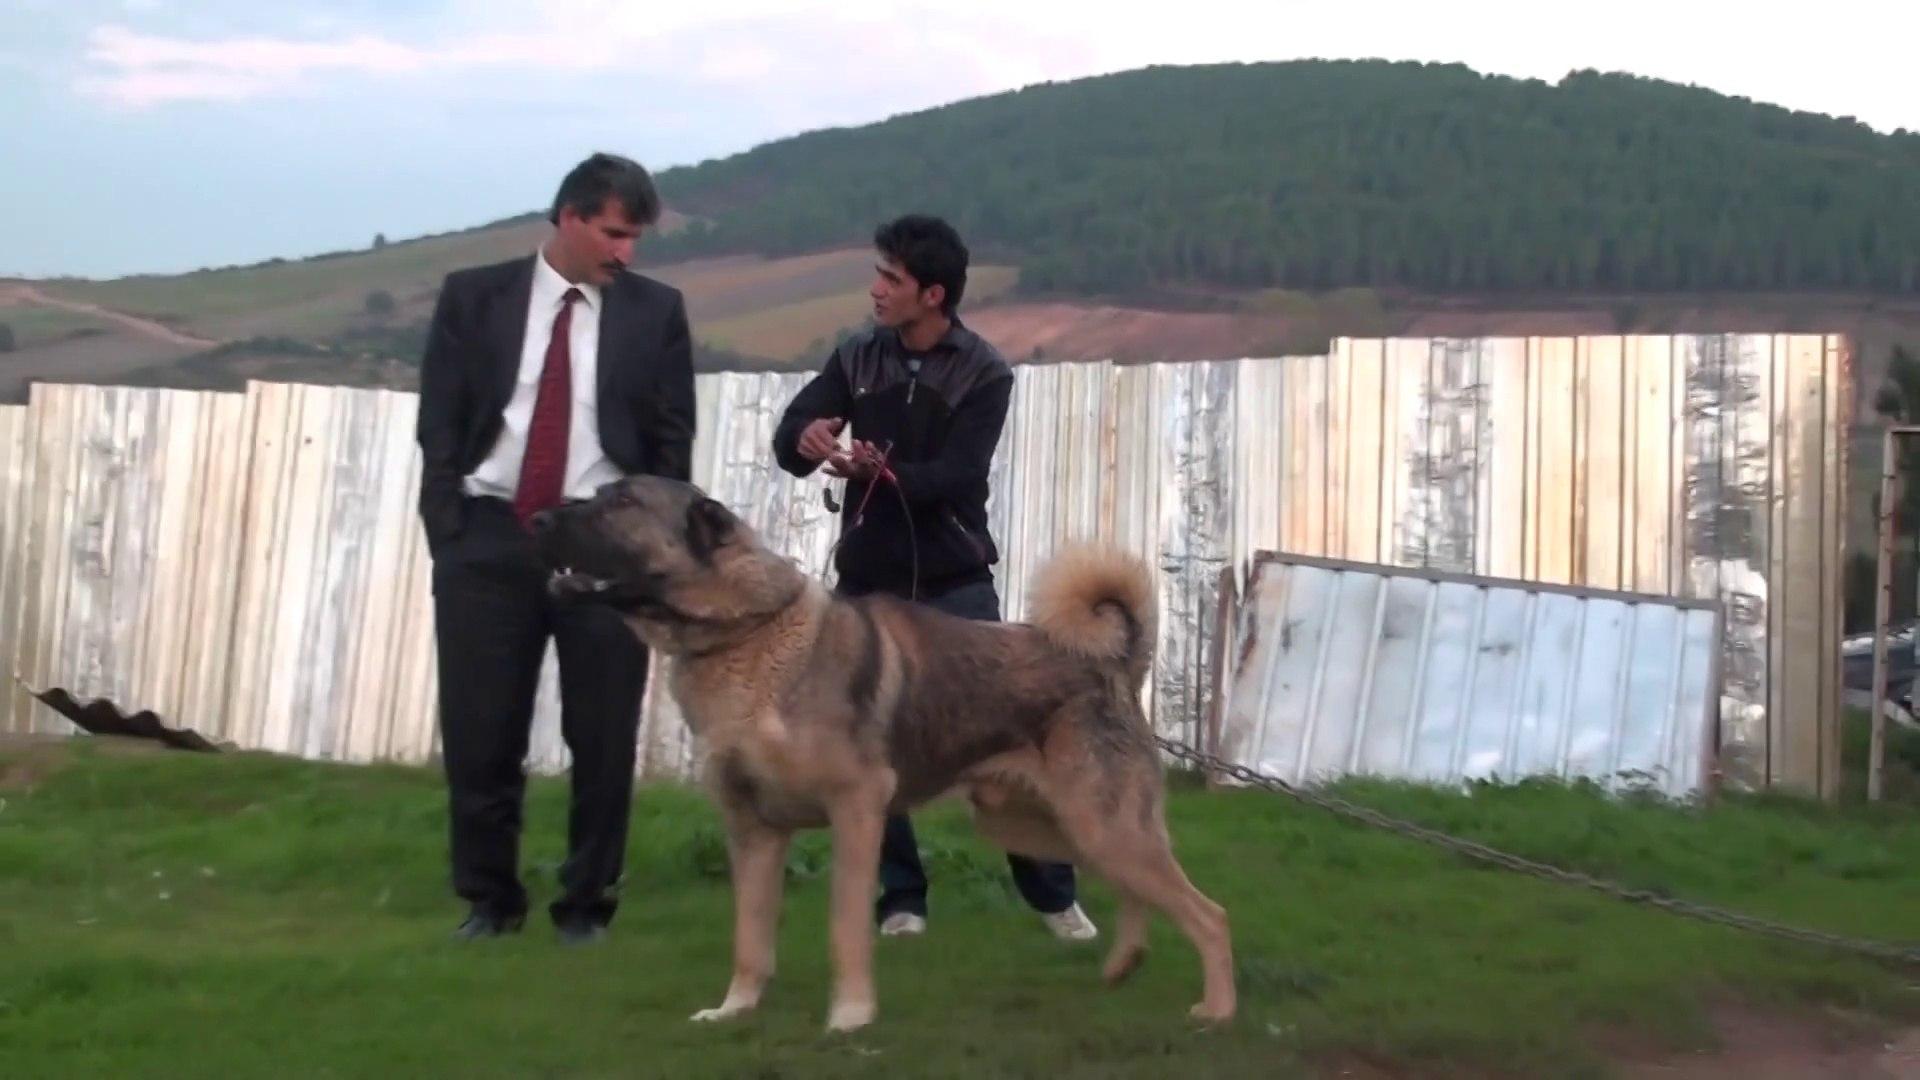 TAM SiMiT KUYRUK ANADOLU COBAN KOPEGi - GiANT and ANGRY ANATOLiAN SHEPHERD DOG